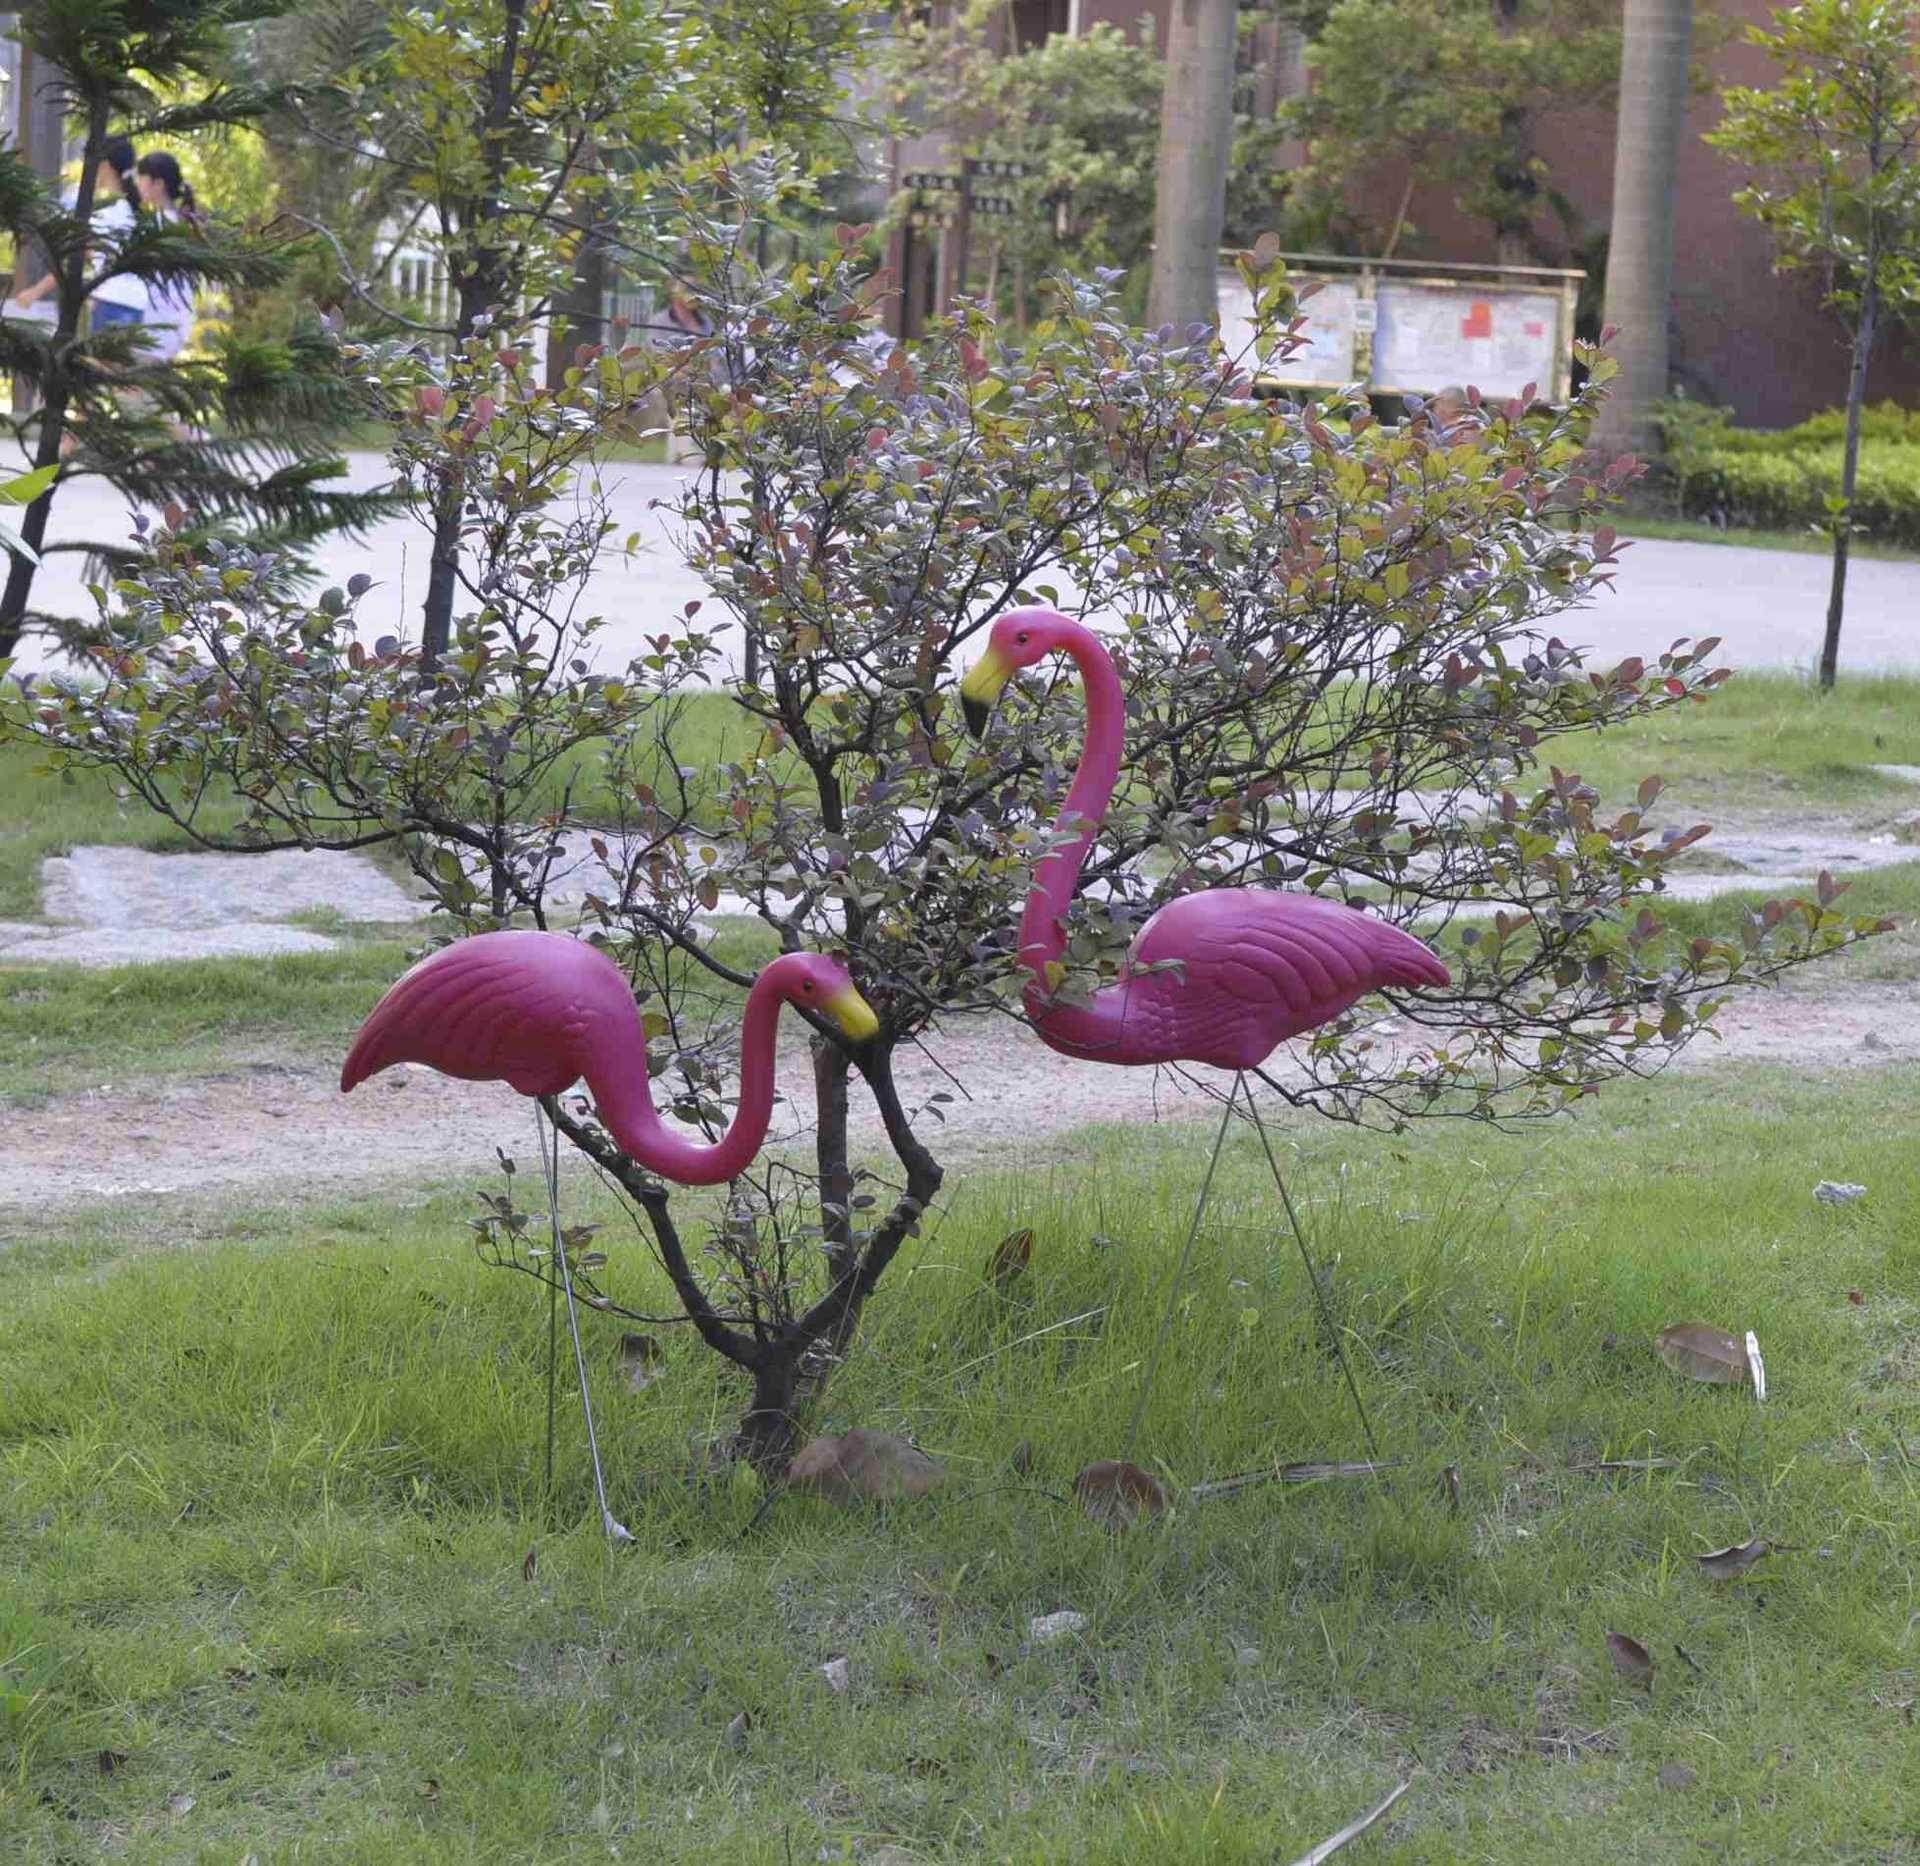 Artificial Flamingo sculpture Garden Courtyard Scenery Decorations ...